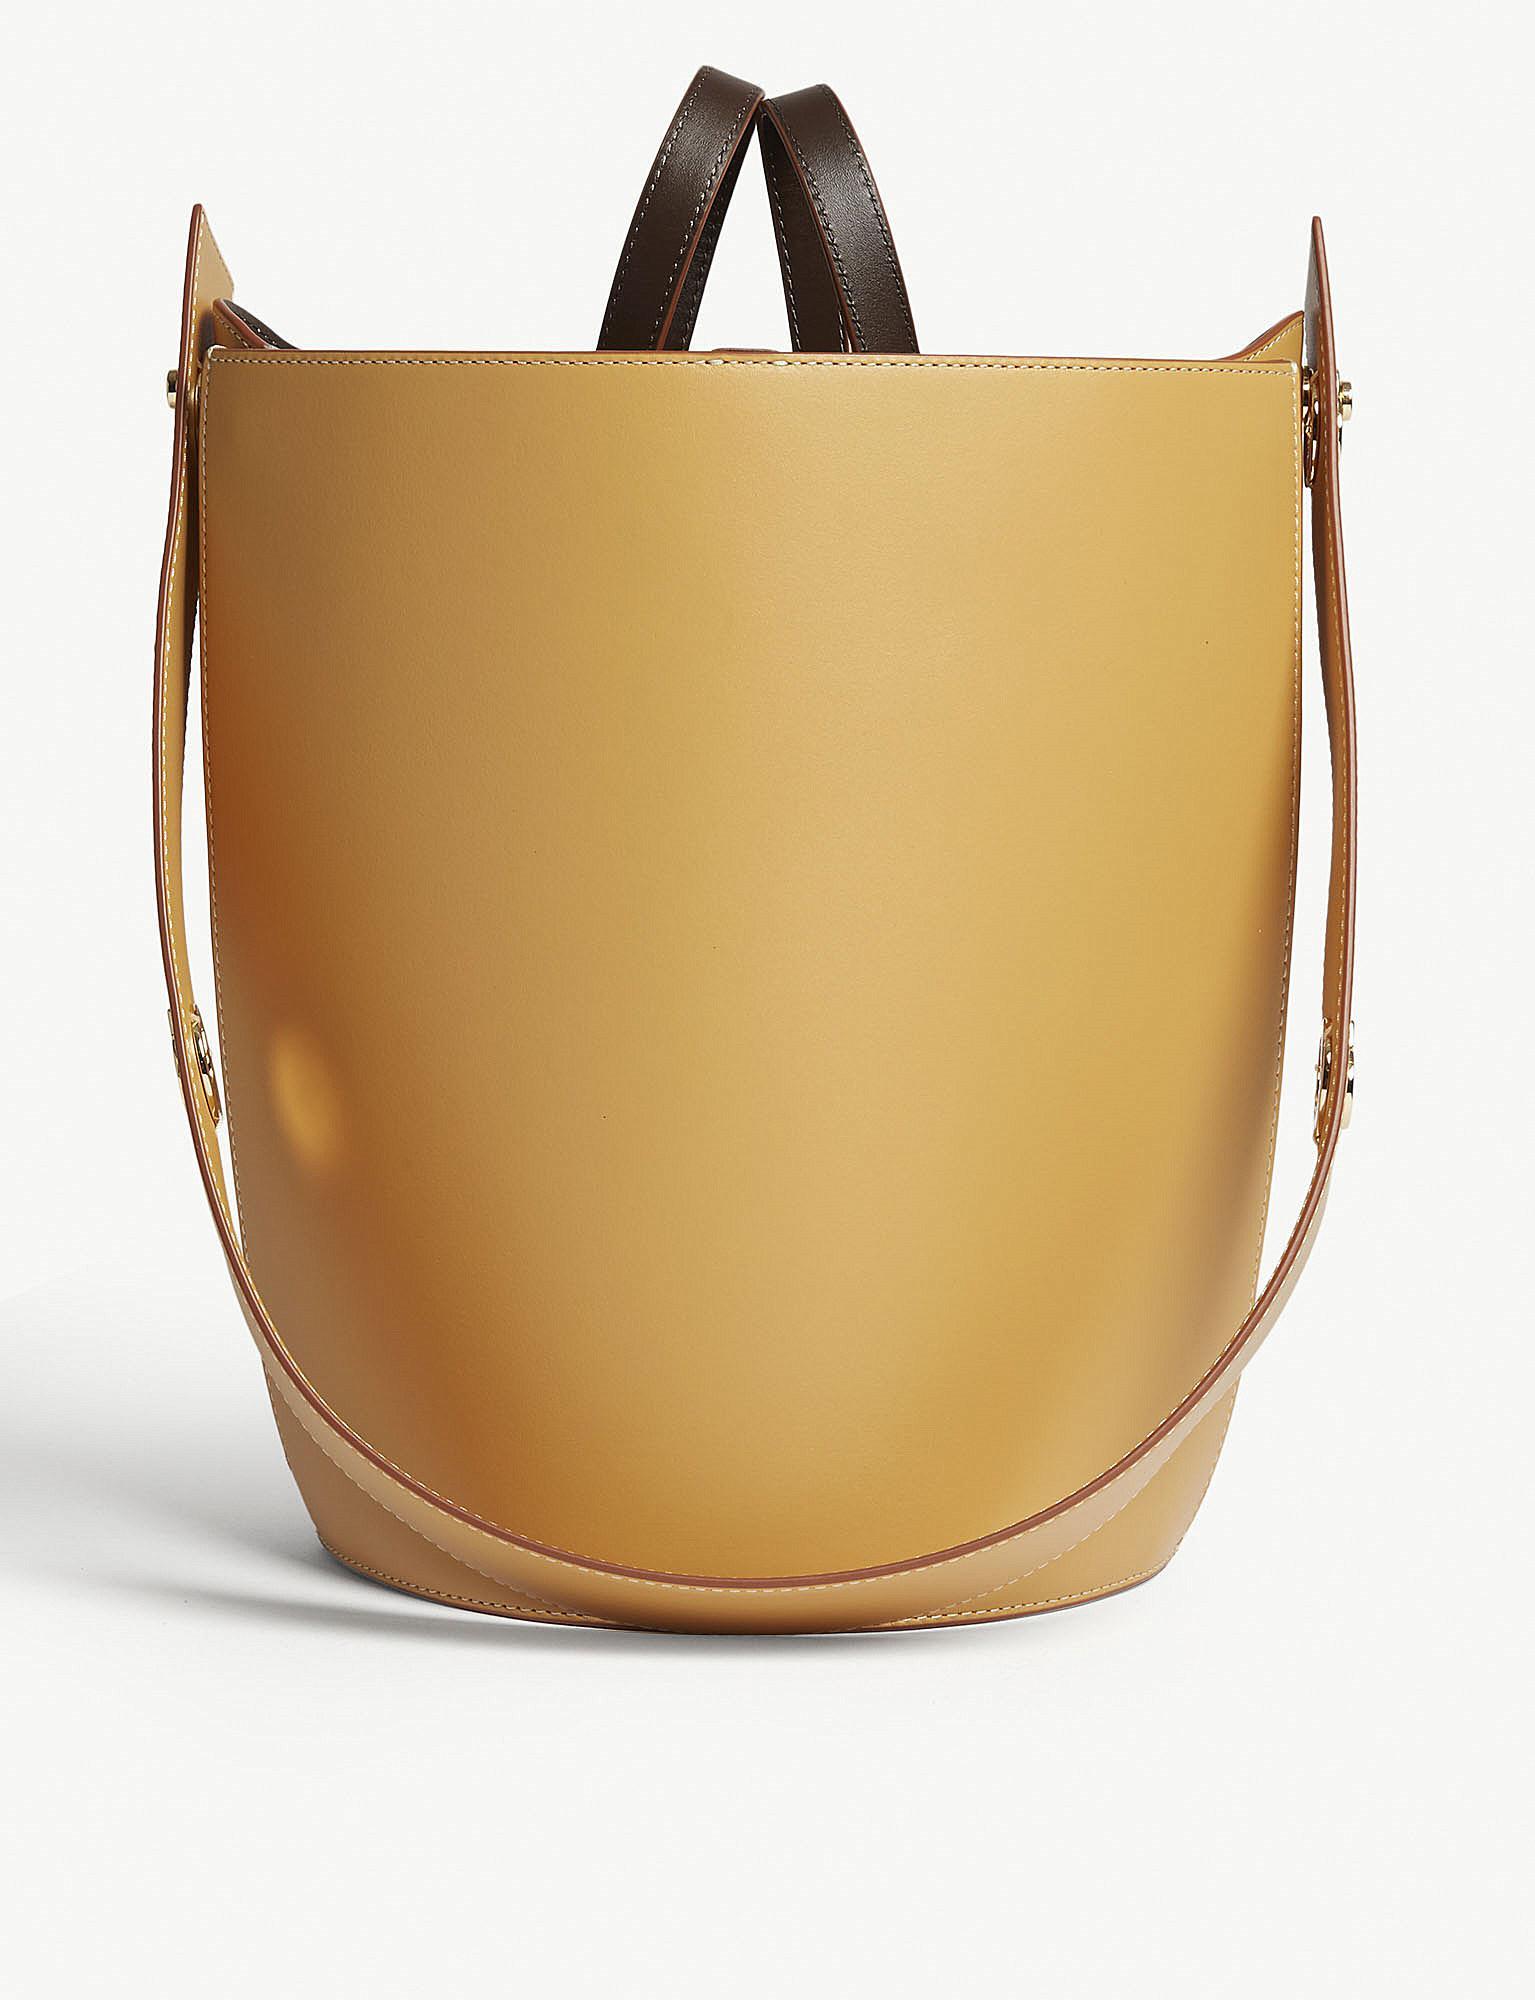 cf5daf79518f0 Danse Lente Sand Brown Mini Lorna Small Leather Bucket Bag in ...